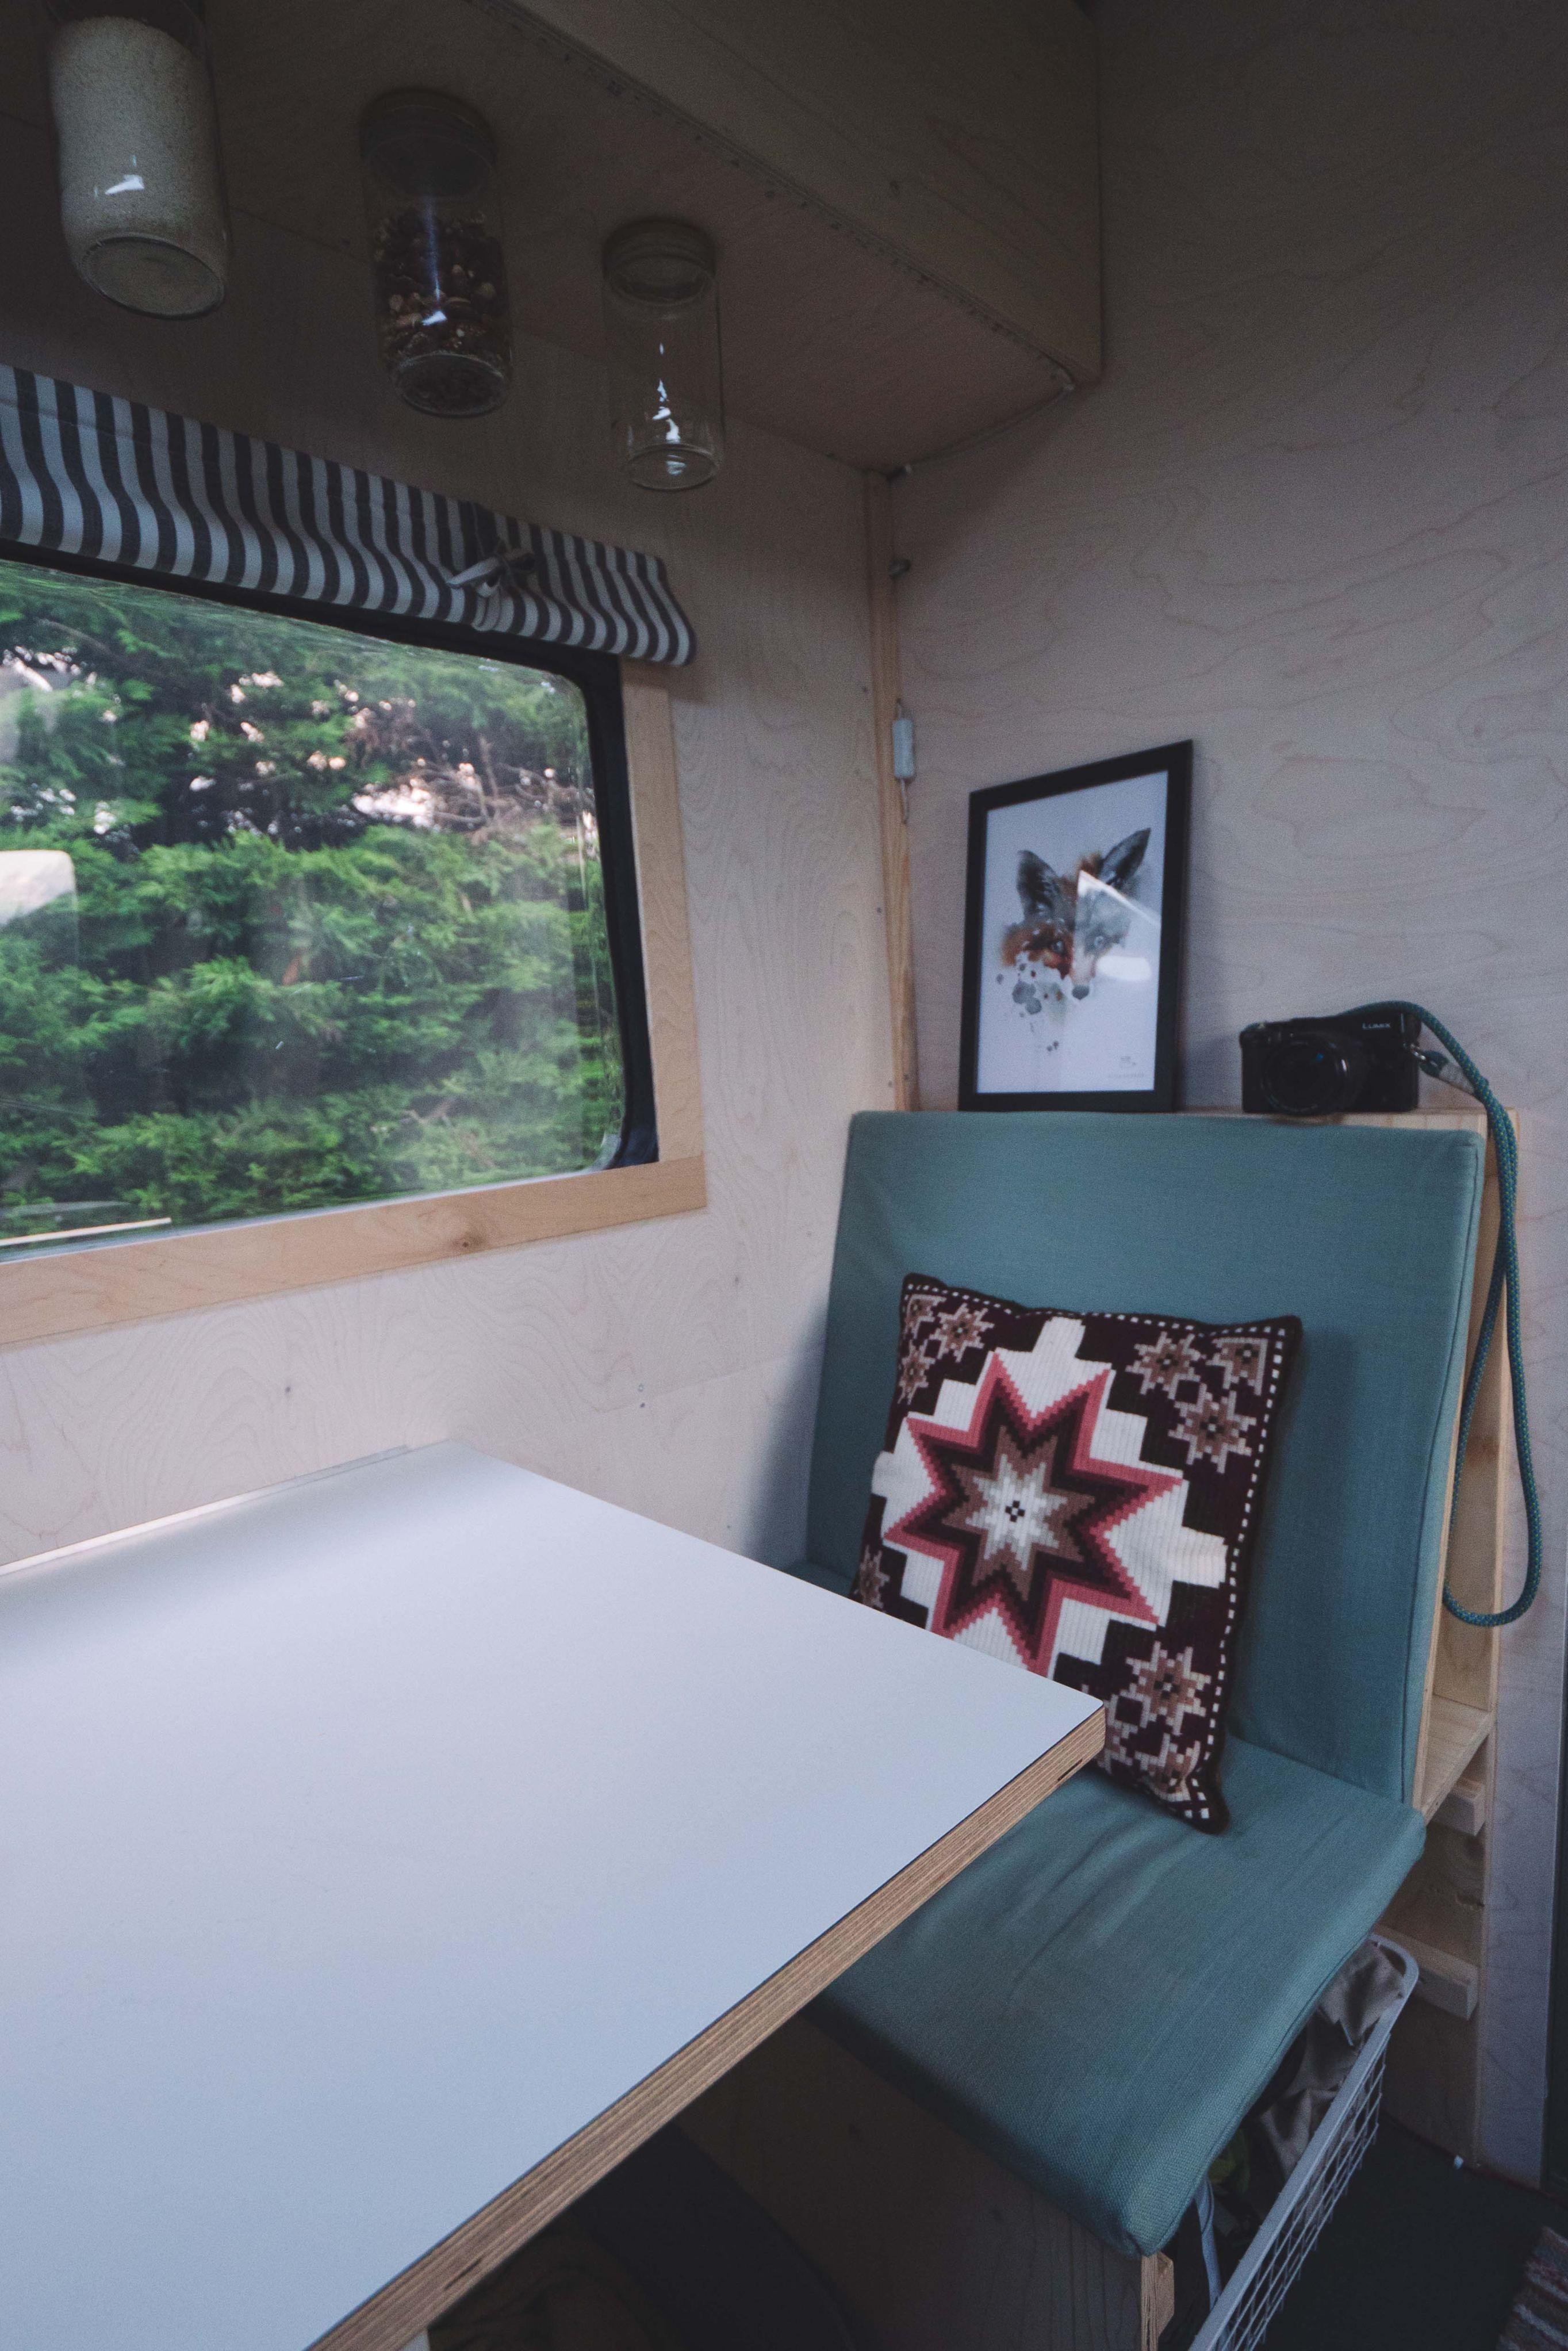 Bedroom interior roof van conversion interior introduction